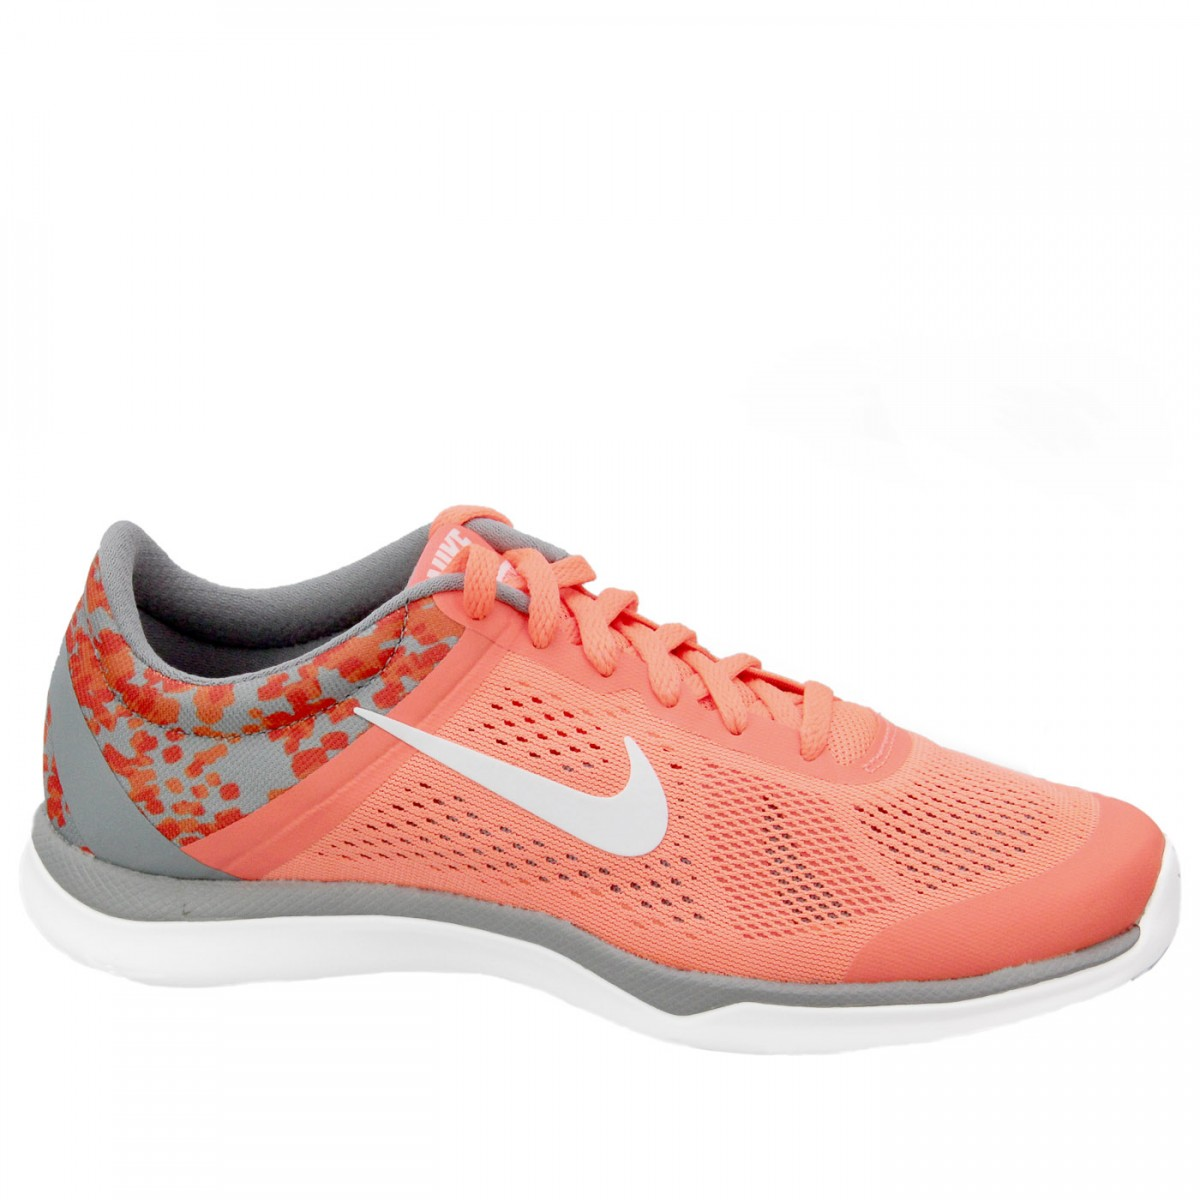 734d6a41b9 ... Preto Anabela 3ce89617c29047  Bizz Store - Tênis Nike Feminino Esportivo  In-Season TR 5 Print 37a7760df3964c ...